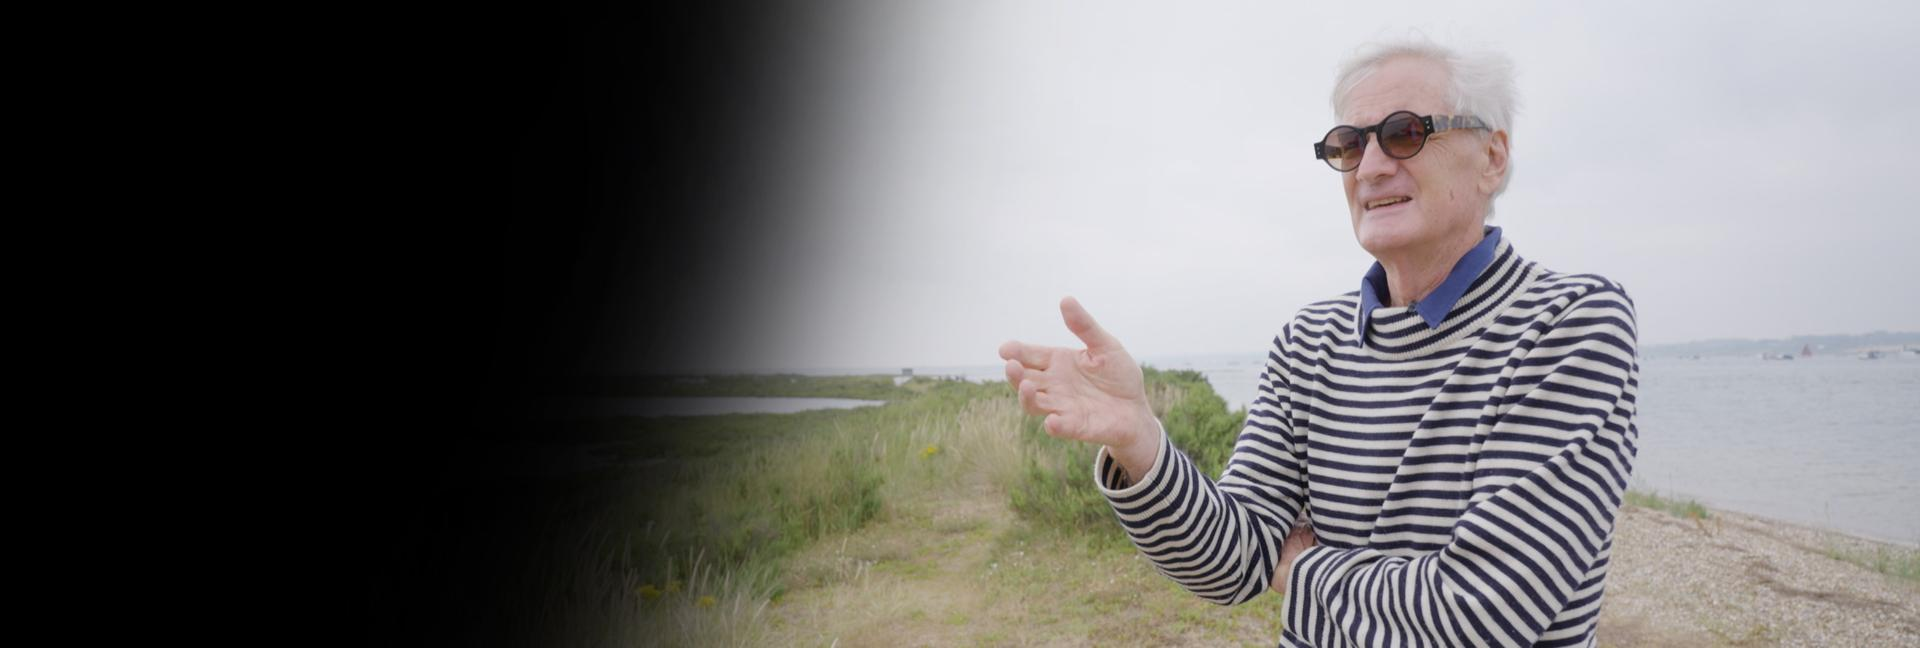 James Dyson stood explaining a story at Blakeney Point